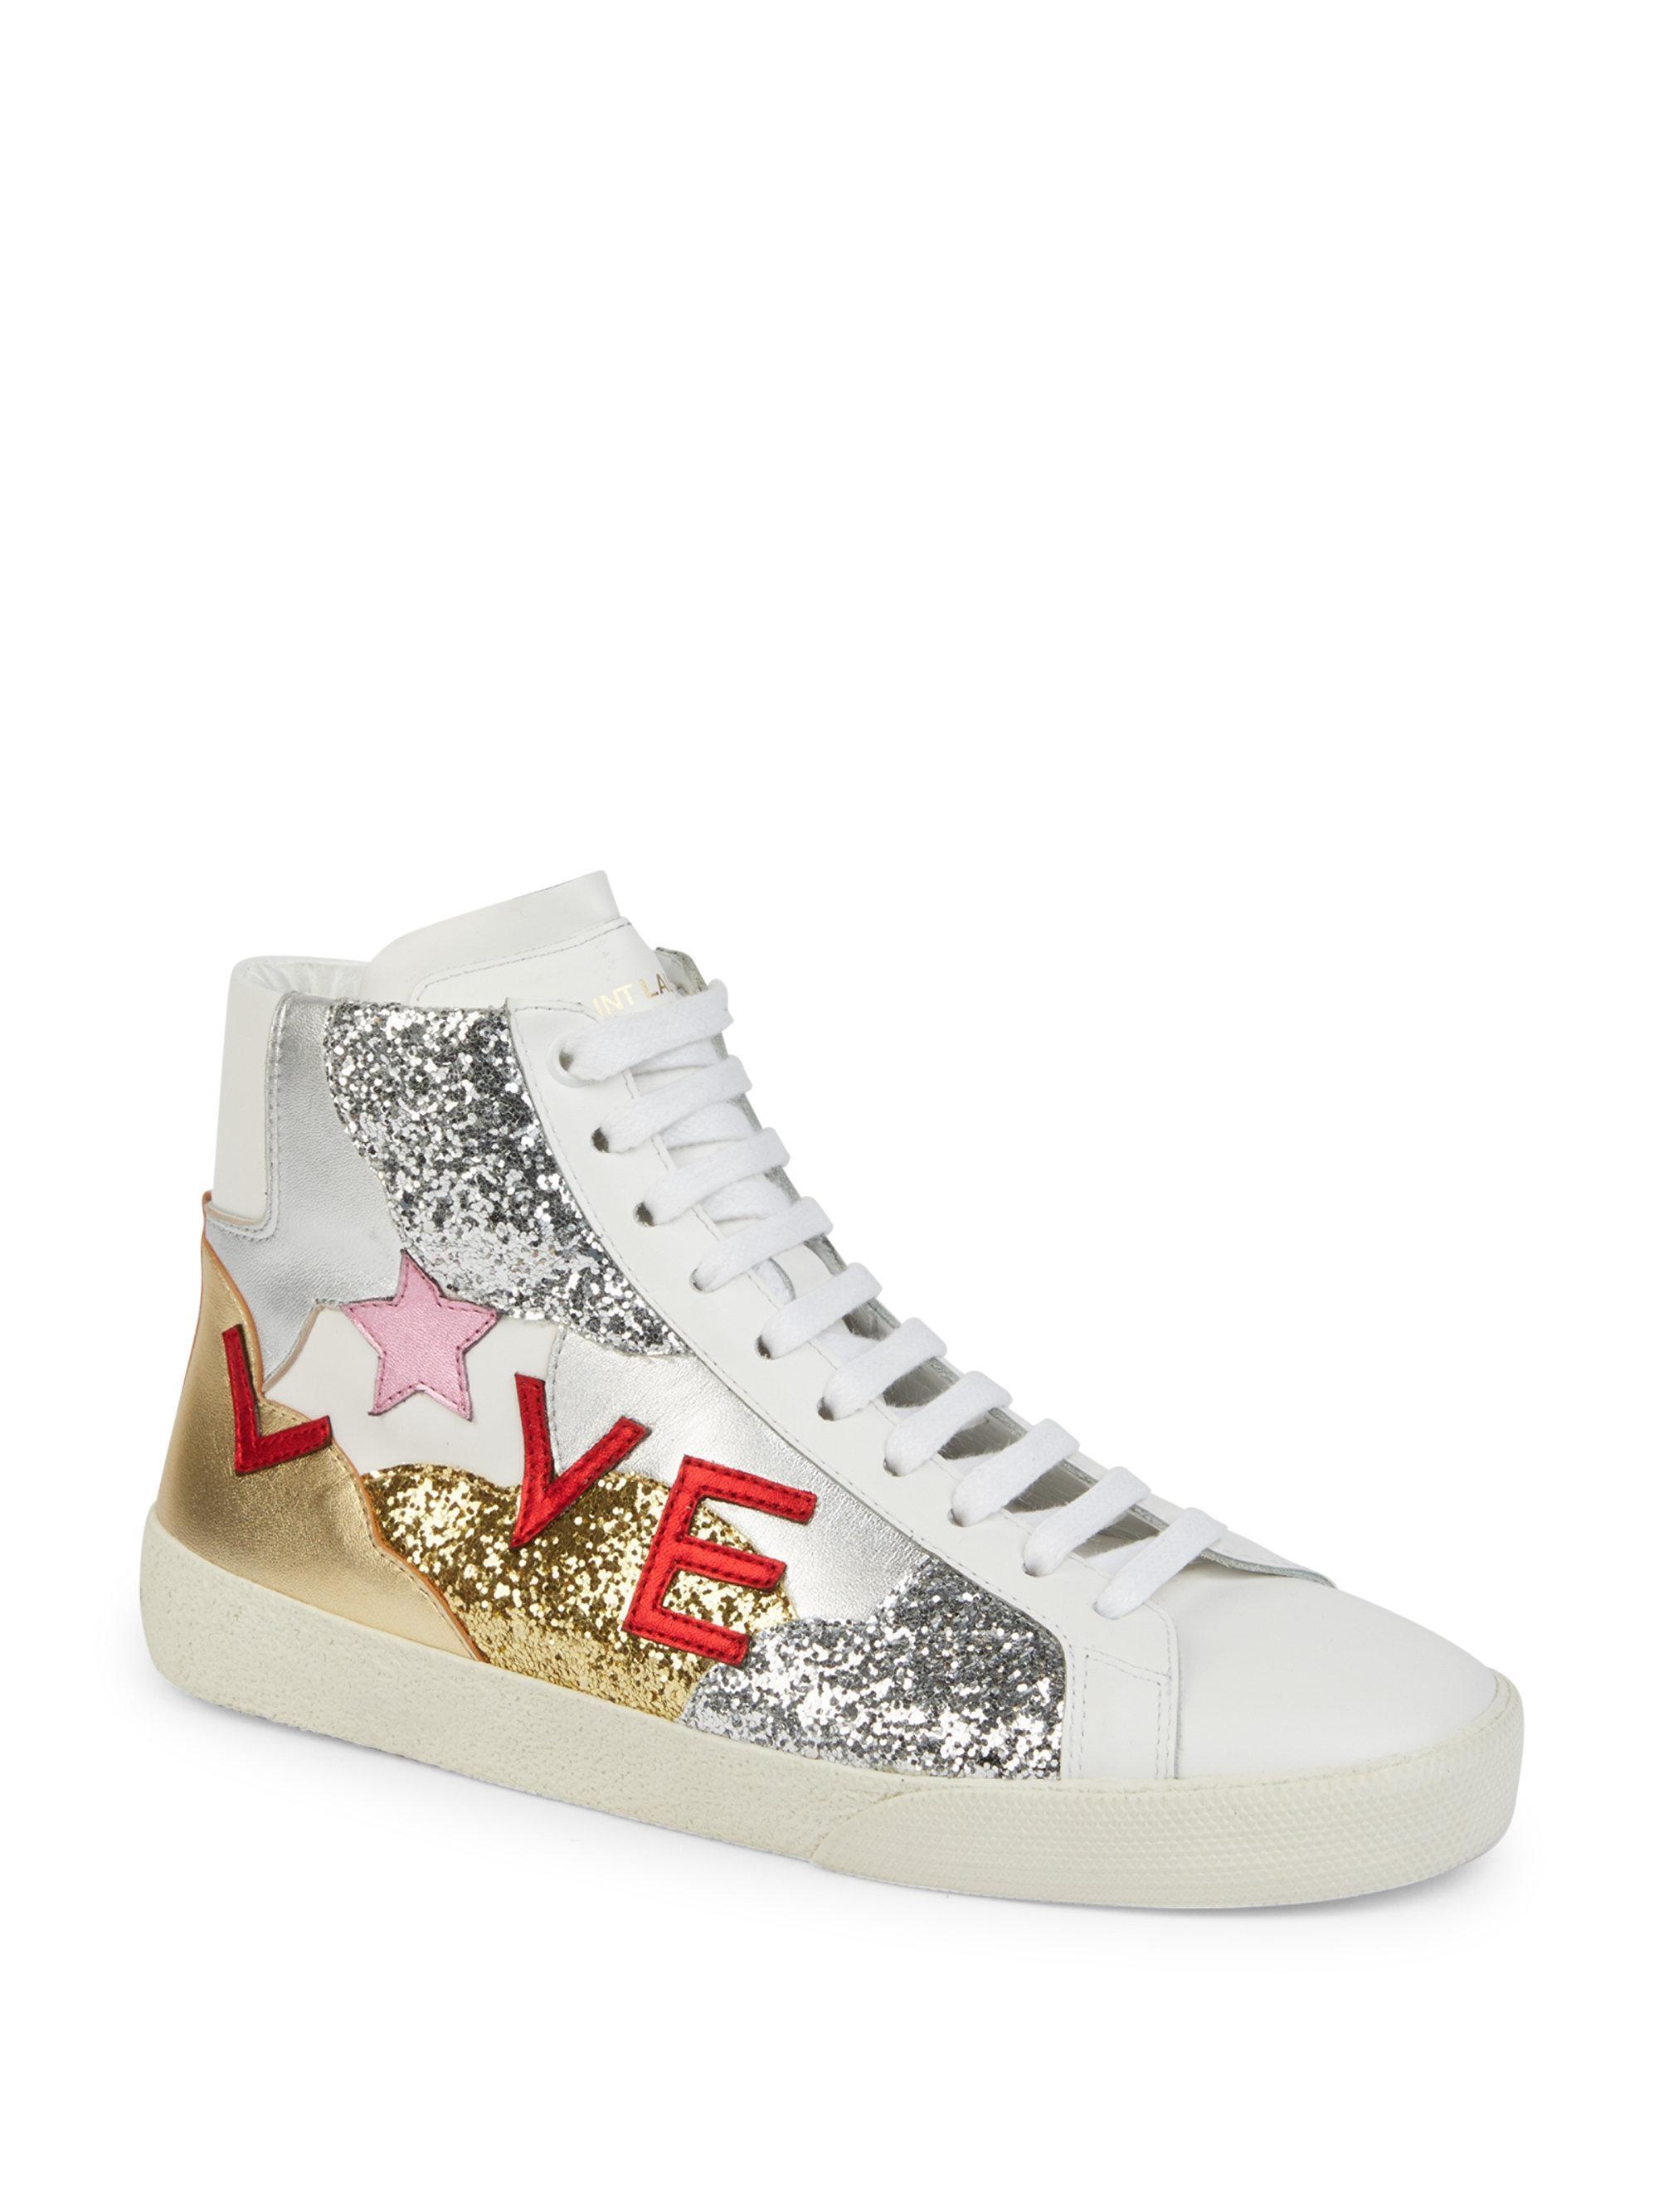 Saint Laurent Love High-Top Sneakers